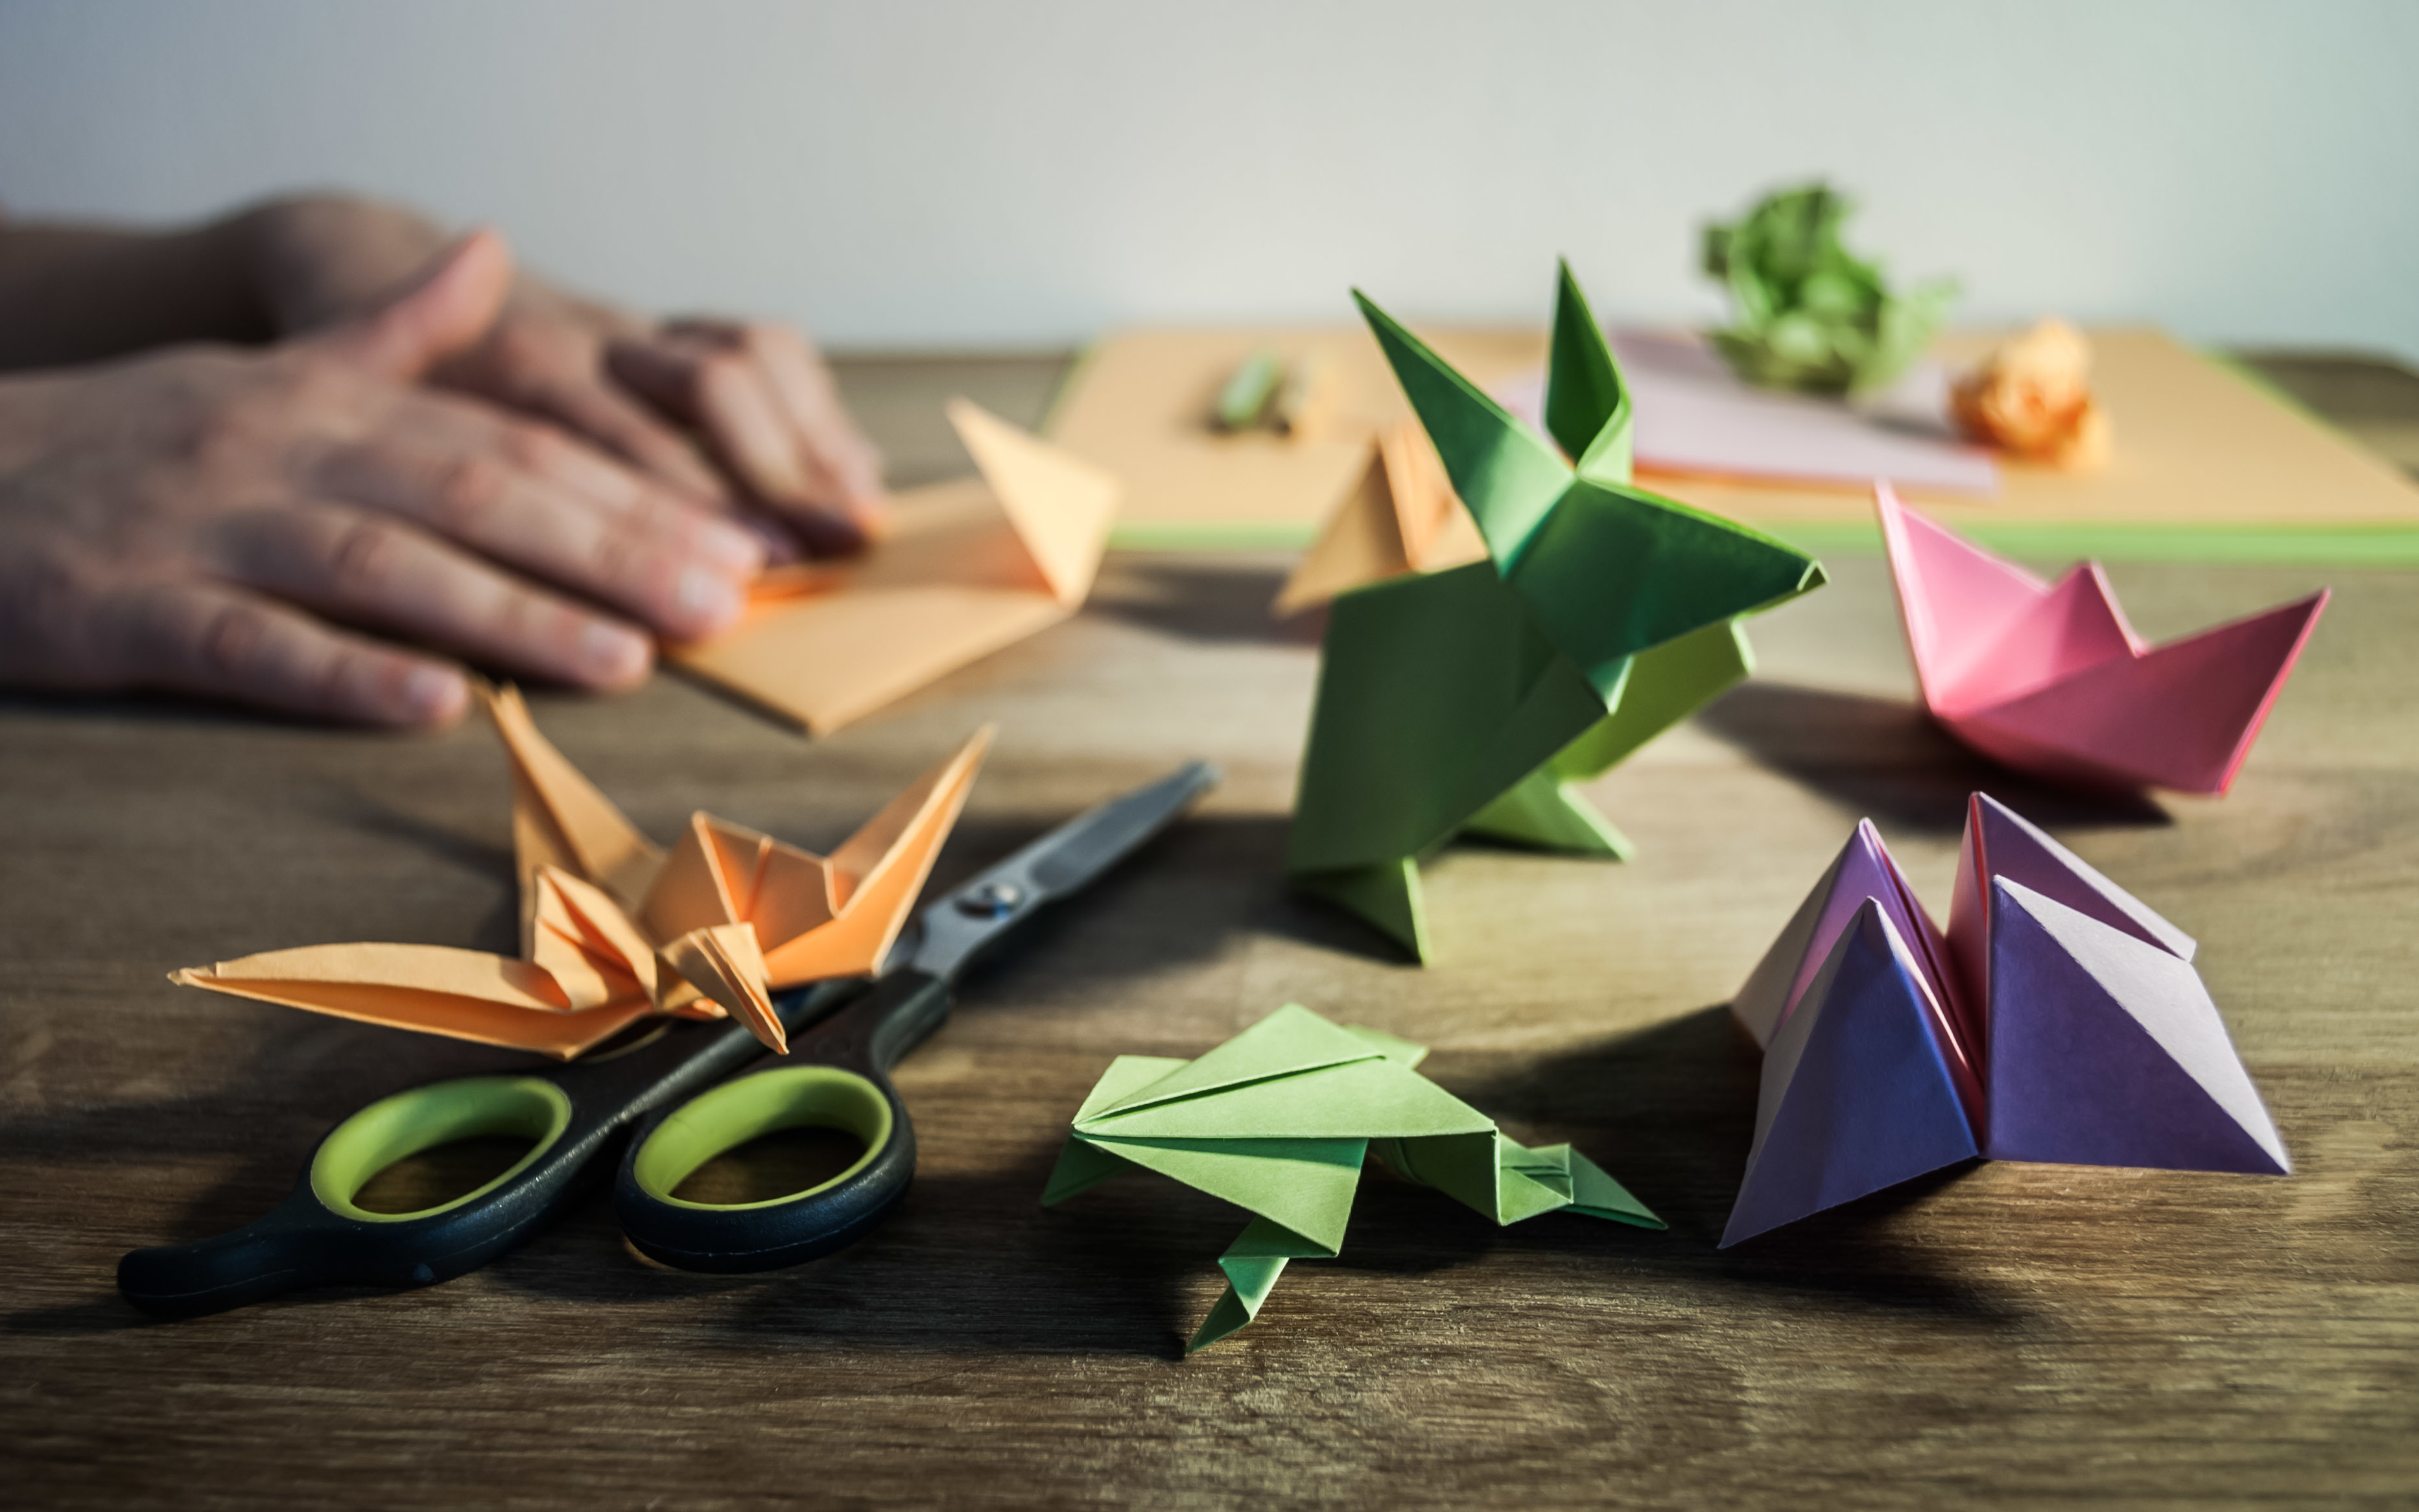 Origami – Η τέχνη του διπλωμένου χαρτιού | Για Ενήλικες